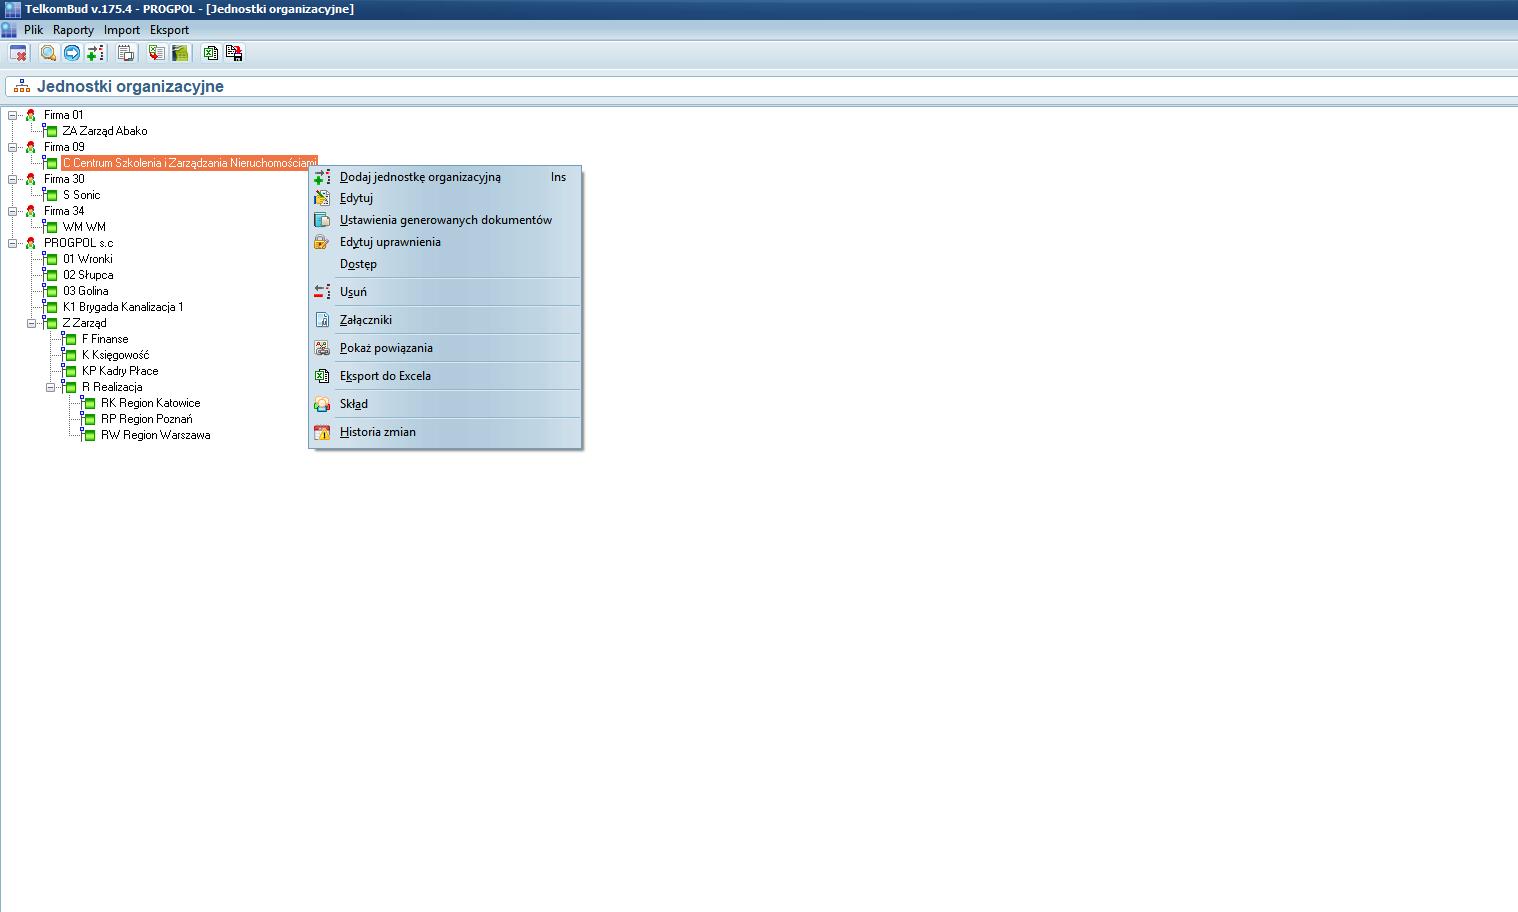 Okno Jednostki organizacyjne systemu TelkomBud